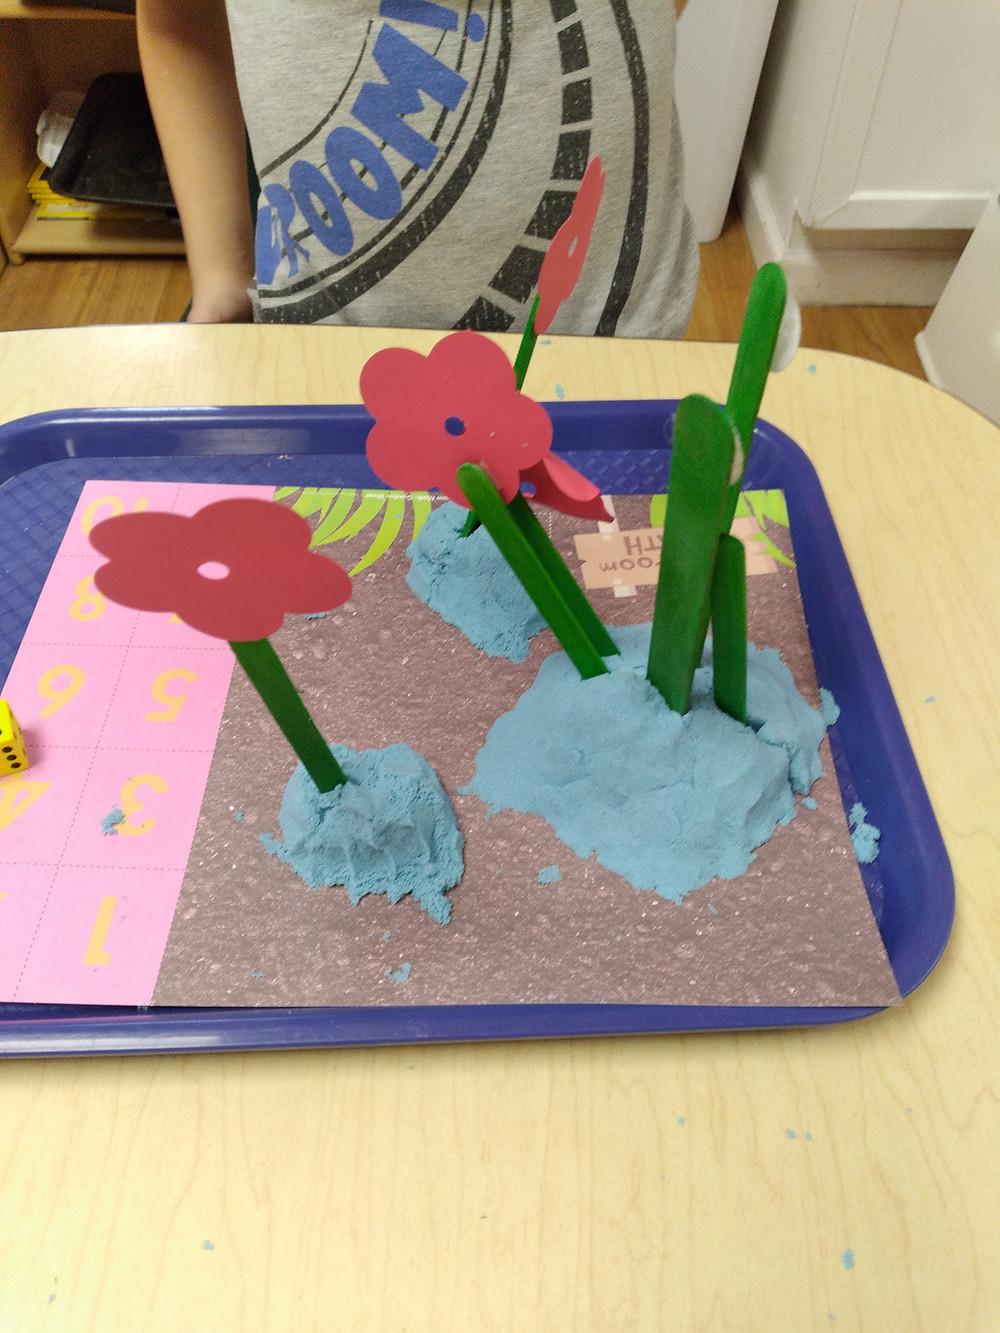 paper flowers attached to craft sticks stuck into playdough